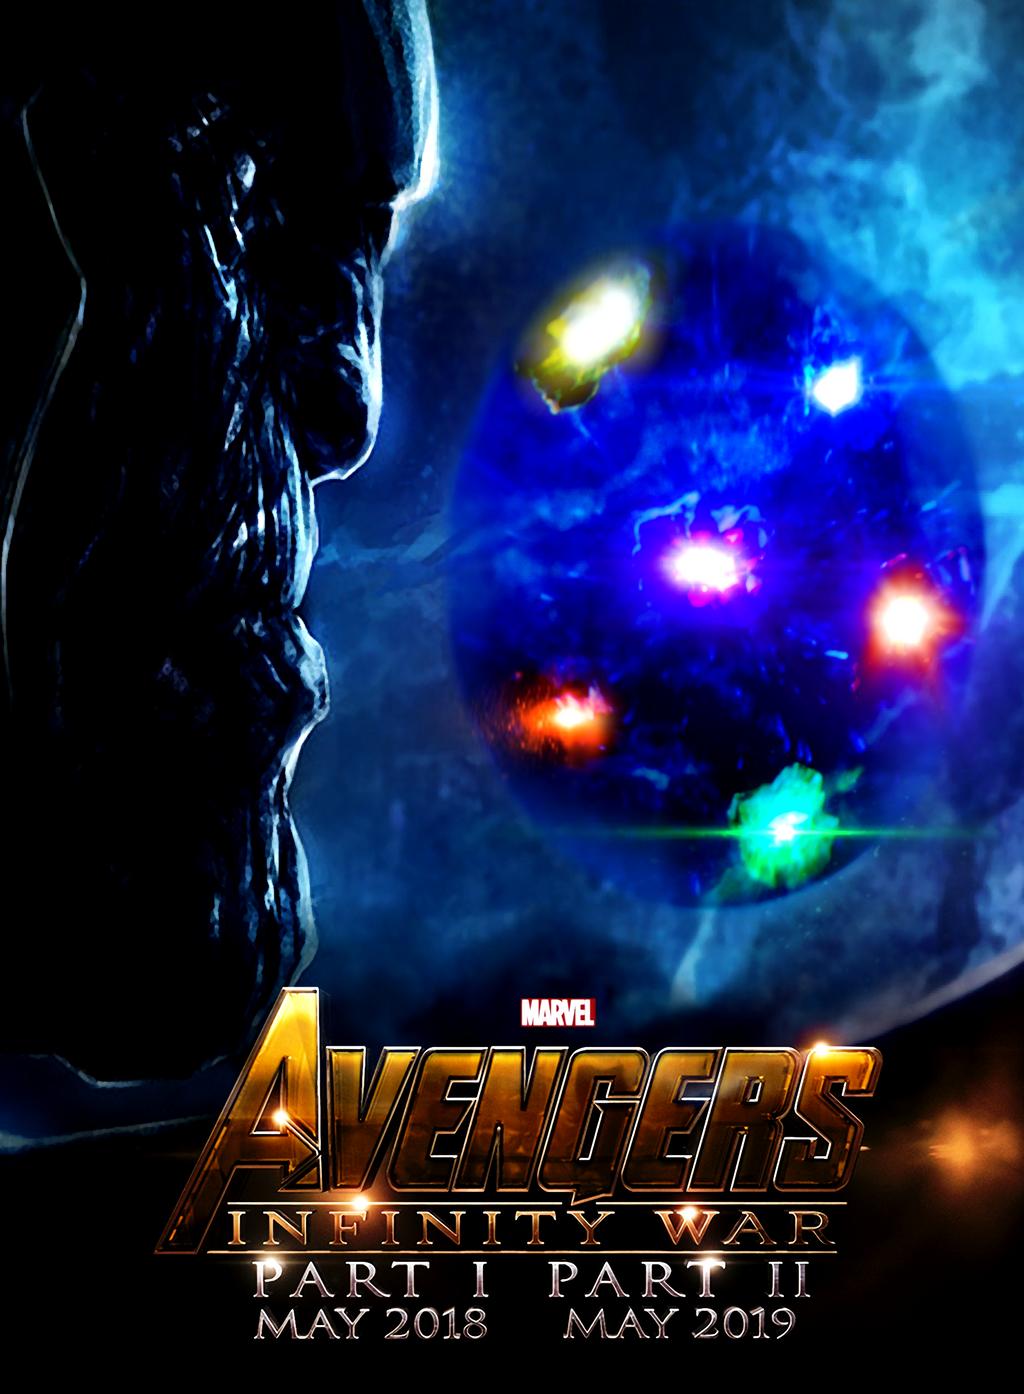 3 part poster design -  Avengers 3 Infinity War Part 1 Part 2 Poster By Urufubdxxx